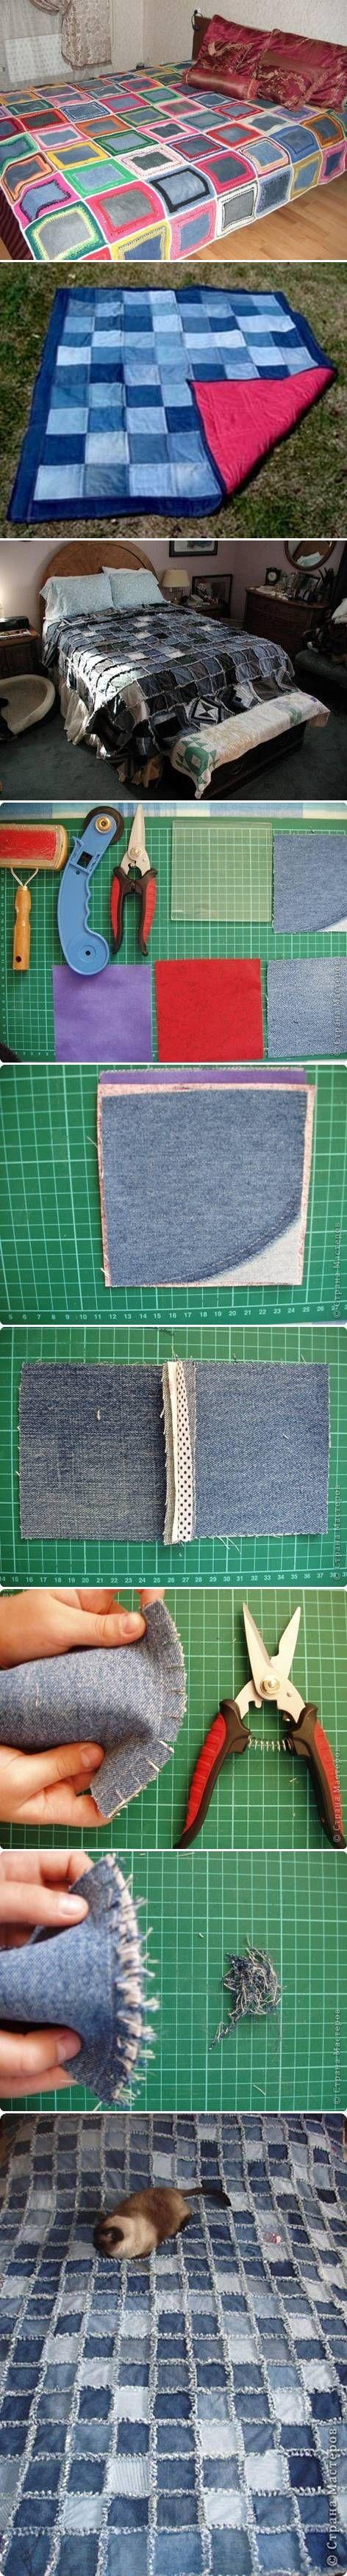 DIY Sew Denim Bedspread Recycled Upcycled denim old jeans RECICLAR REUTILIZAR VIEJOS PANTALONES TEJANOS COLCHAS PATCHWORK